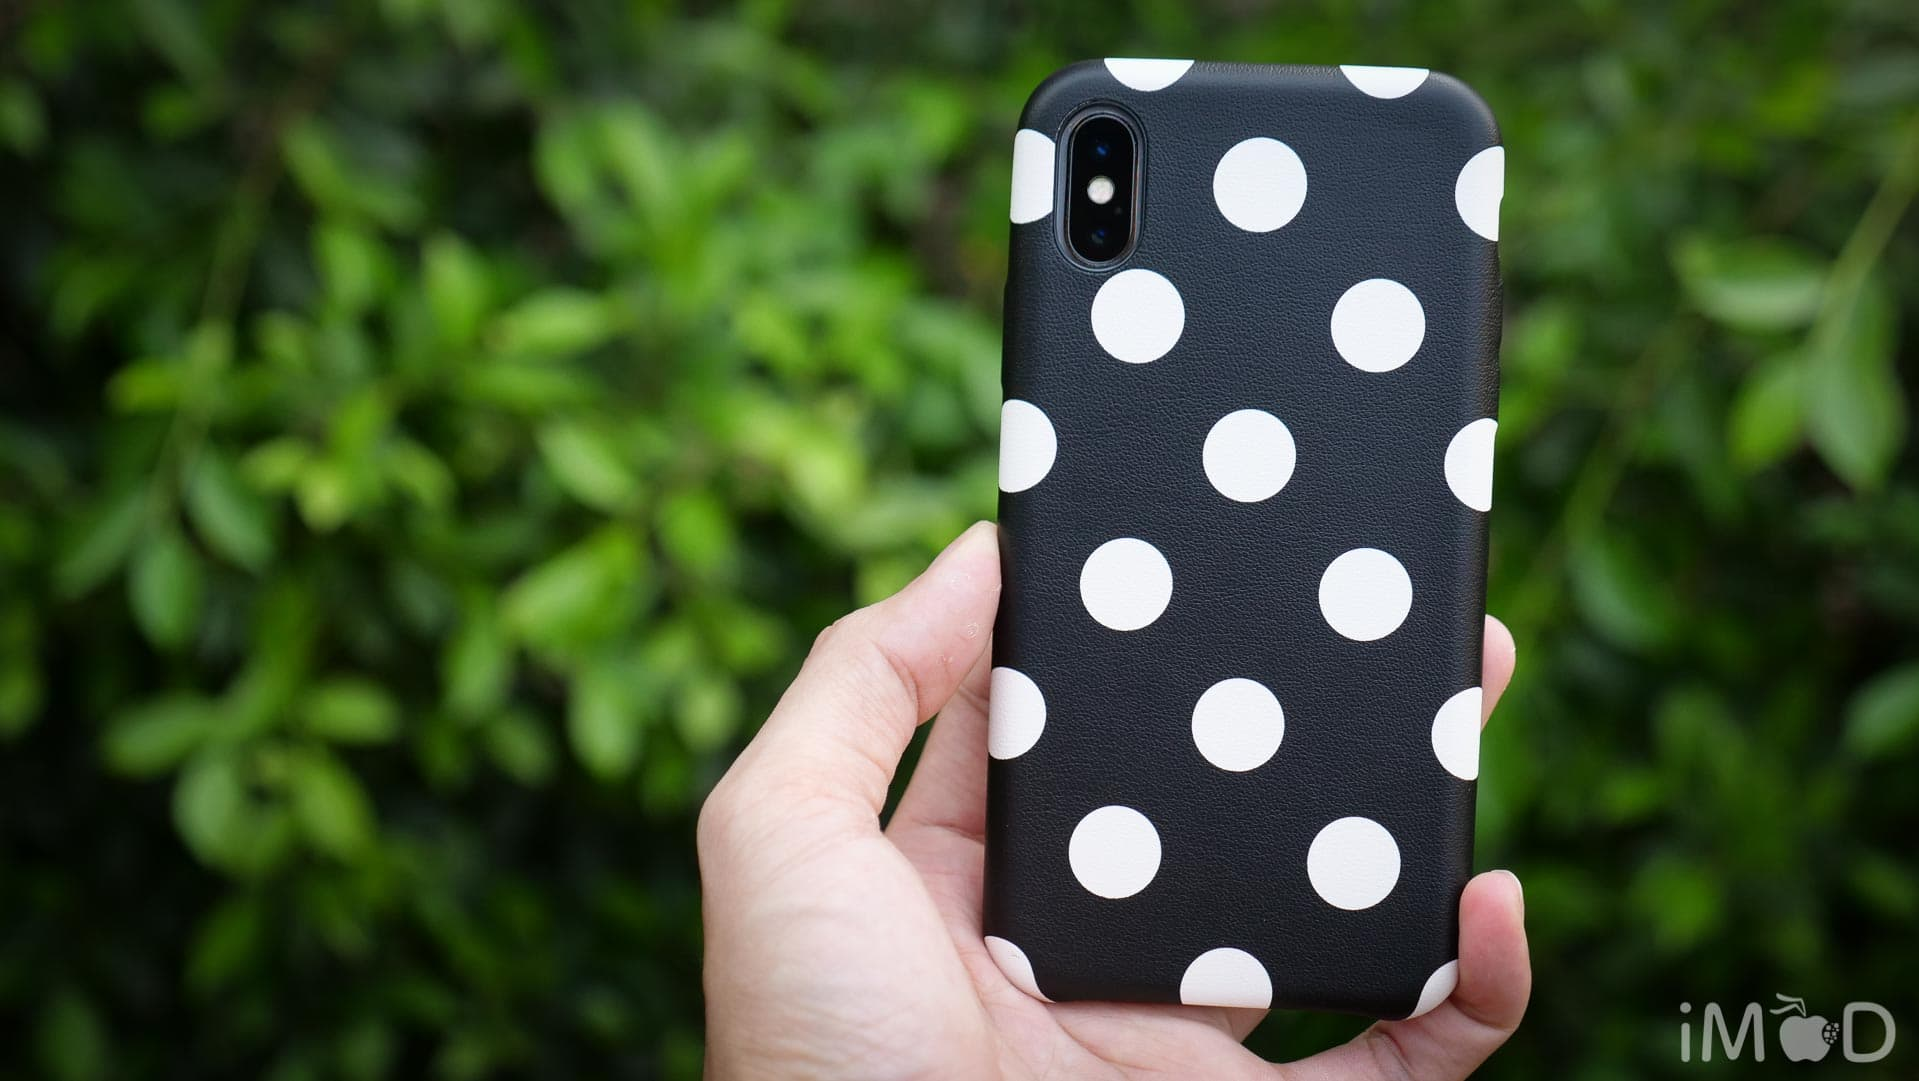 Jtlegend Pokla Leather Case Iphone X 8657